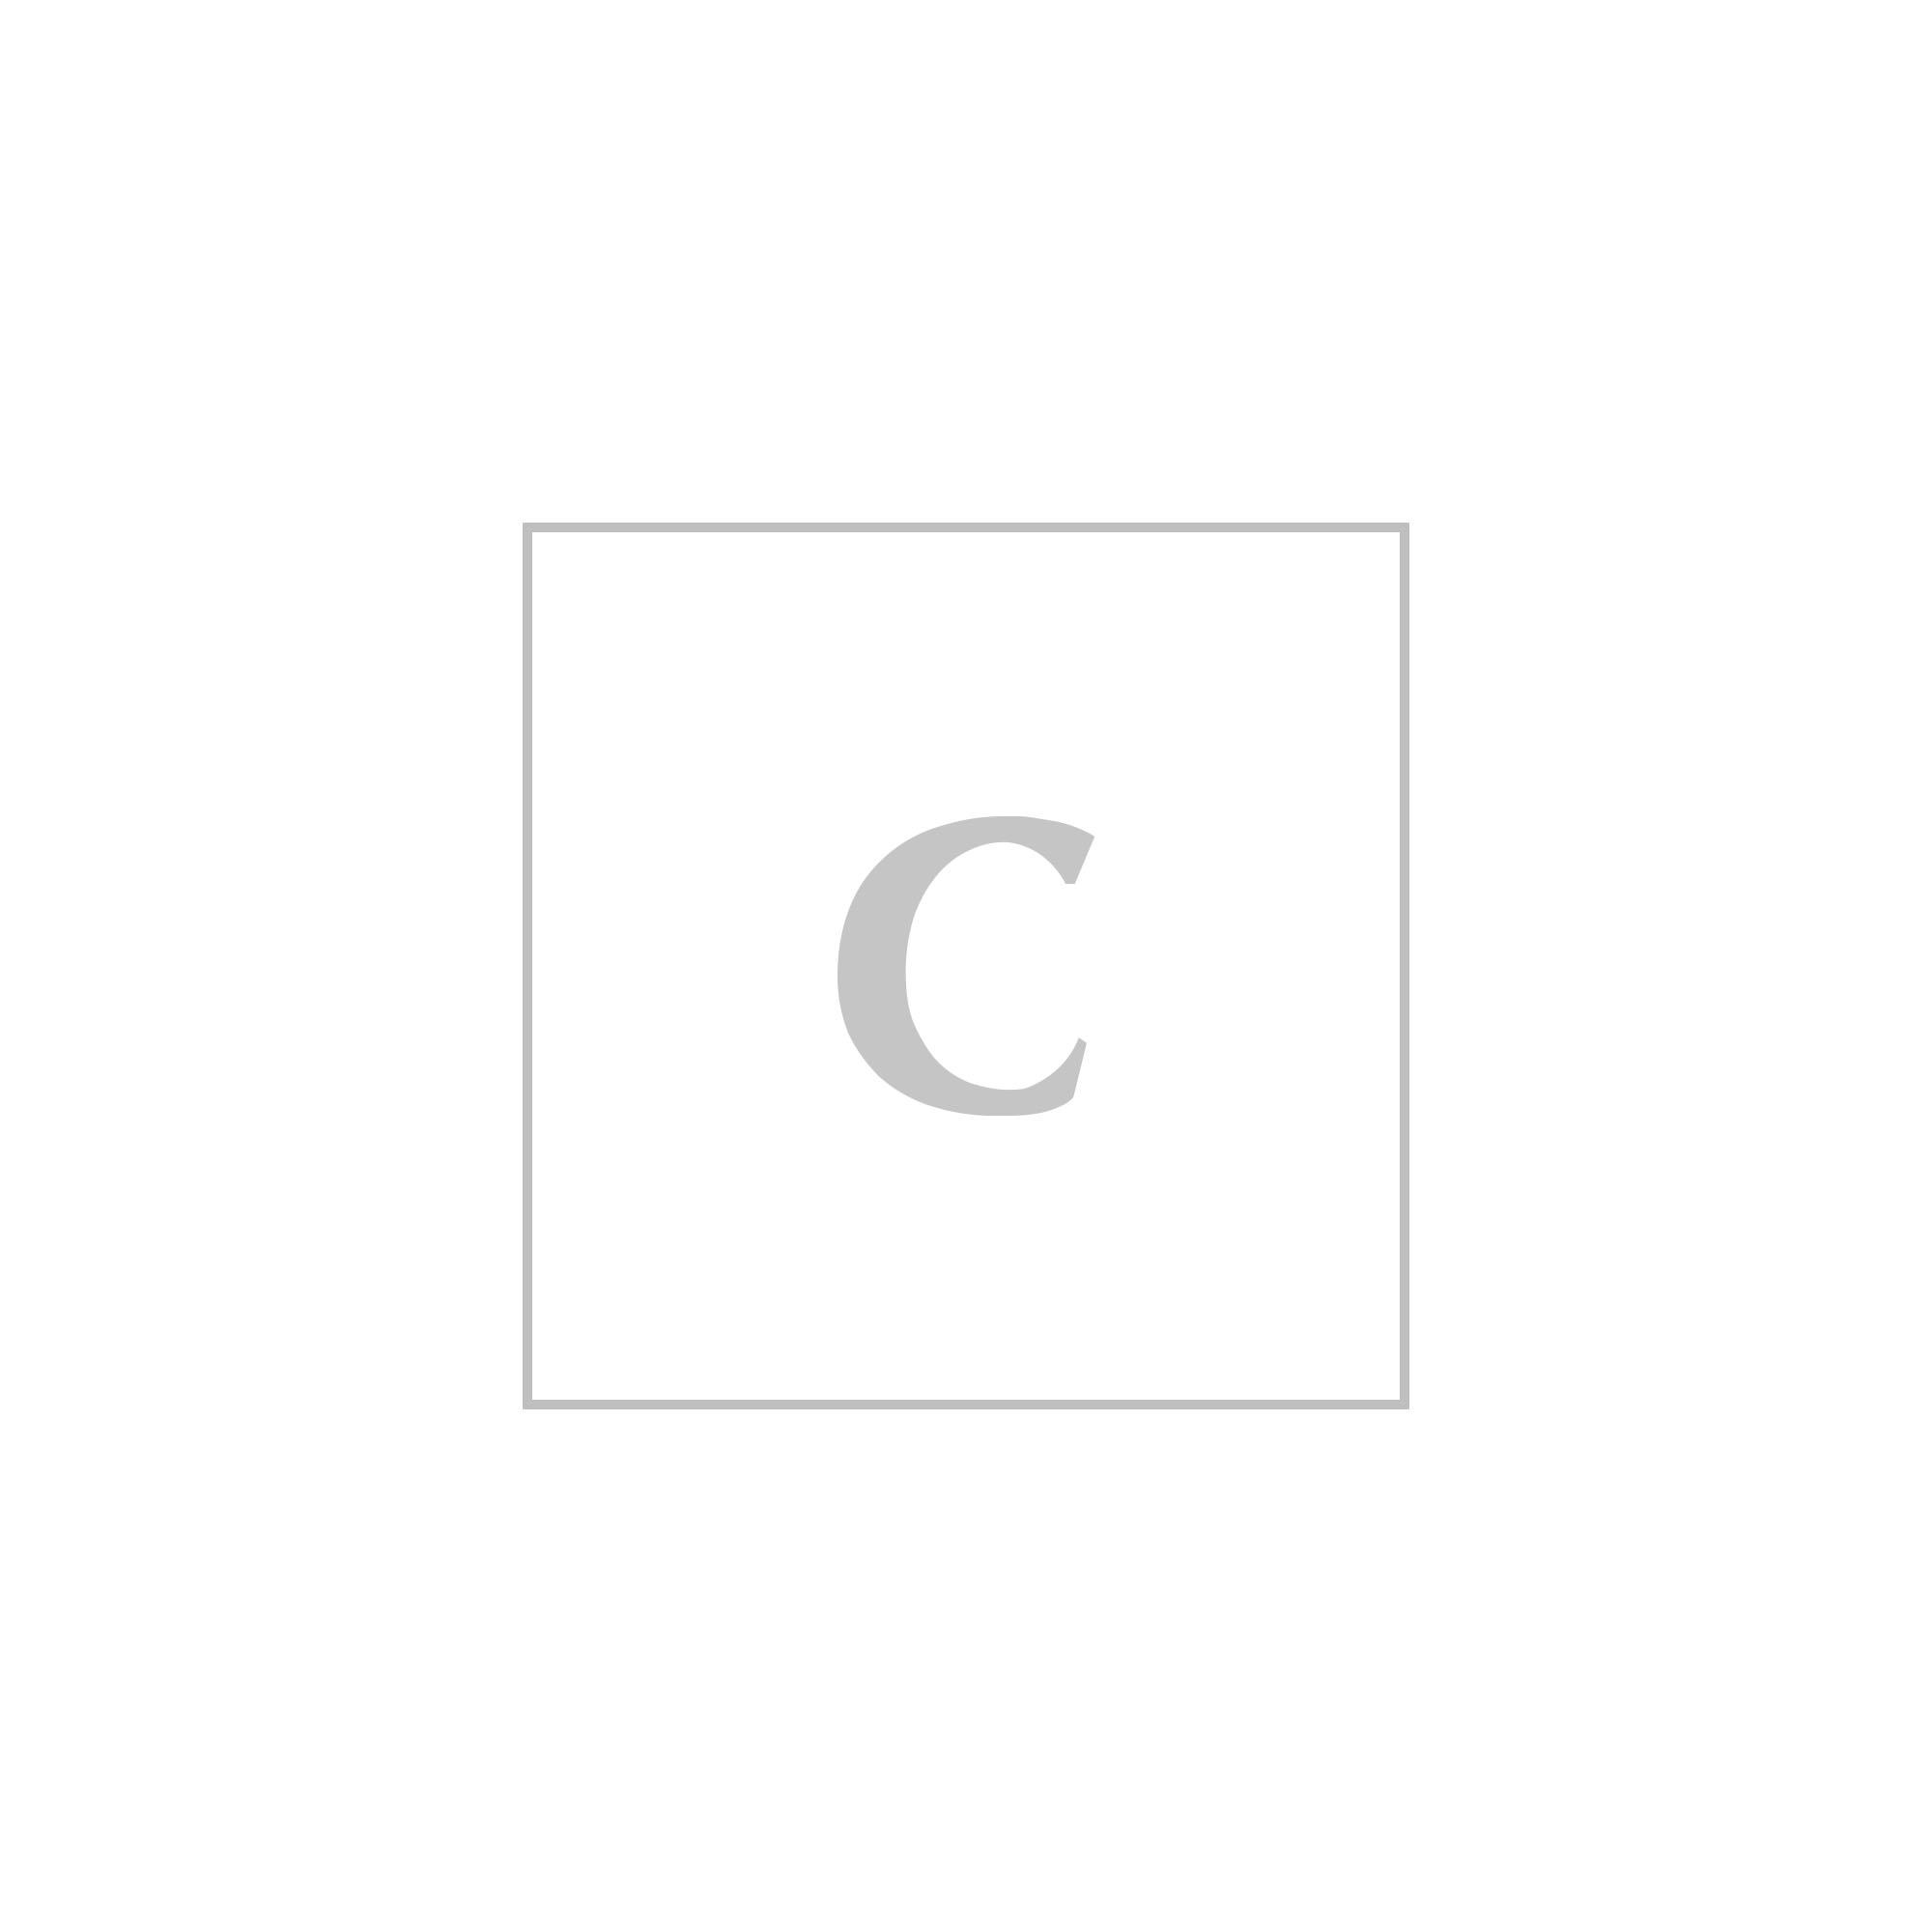 Dolce & gabbana borsa messenger nylon e stampa dauphine